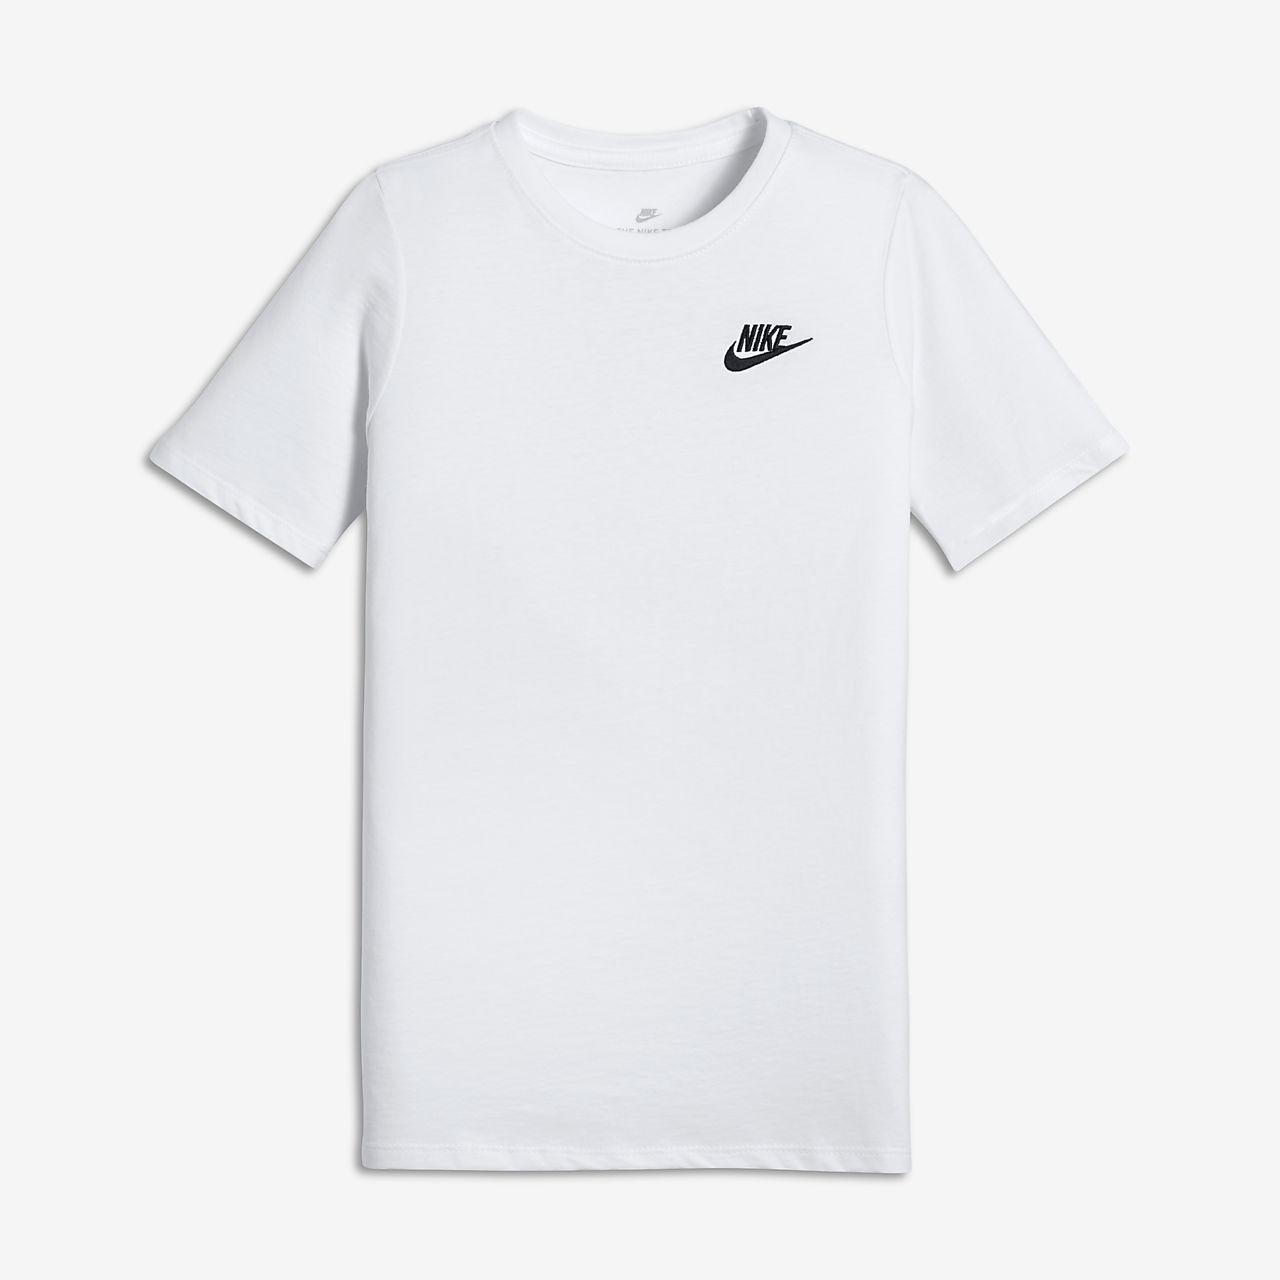 official supplier cheap presenting Nike Futura Logo Older Kids' (Boys') T-Shirt